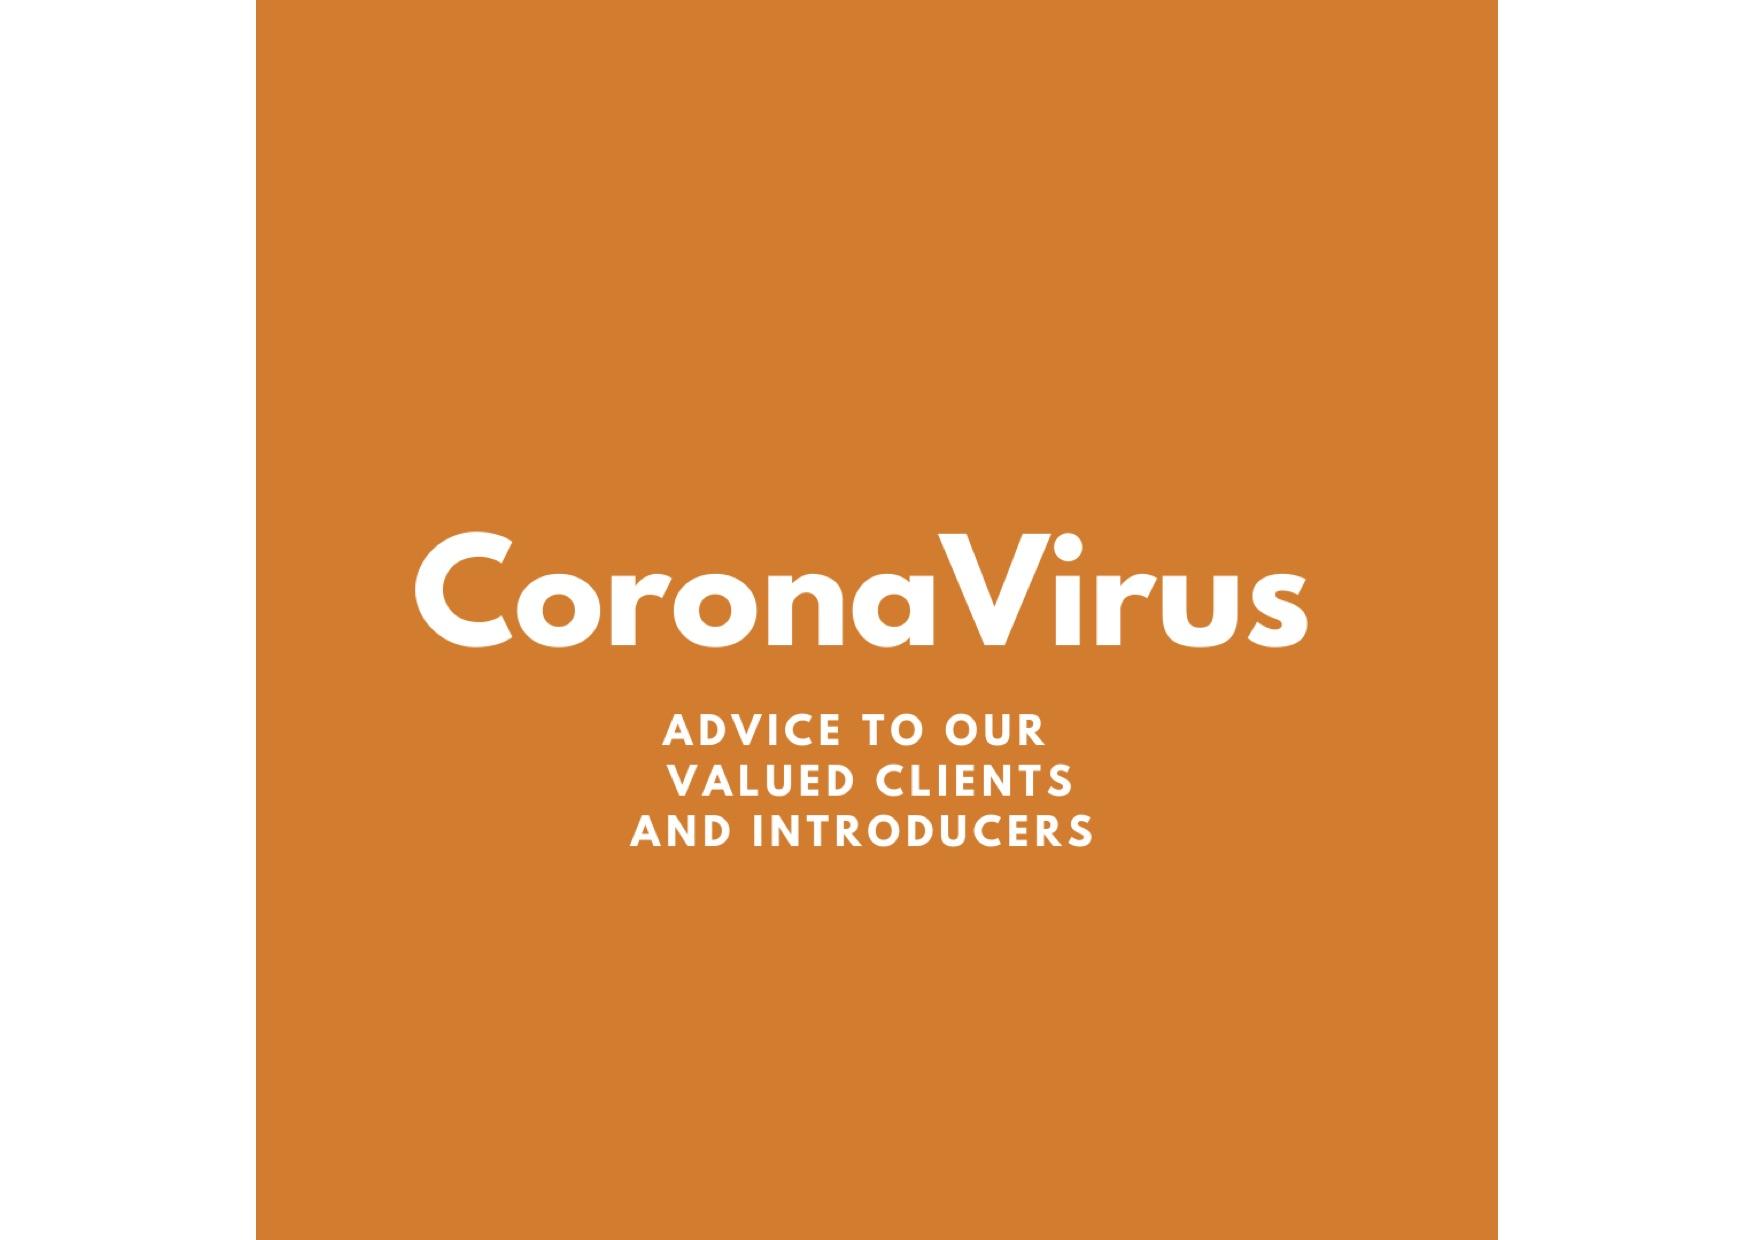 Pulse Cashflow, Business Support, Coronavirus